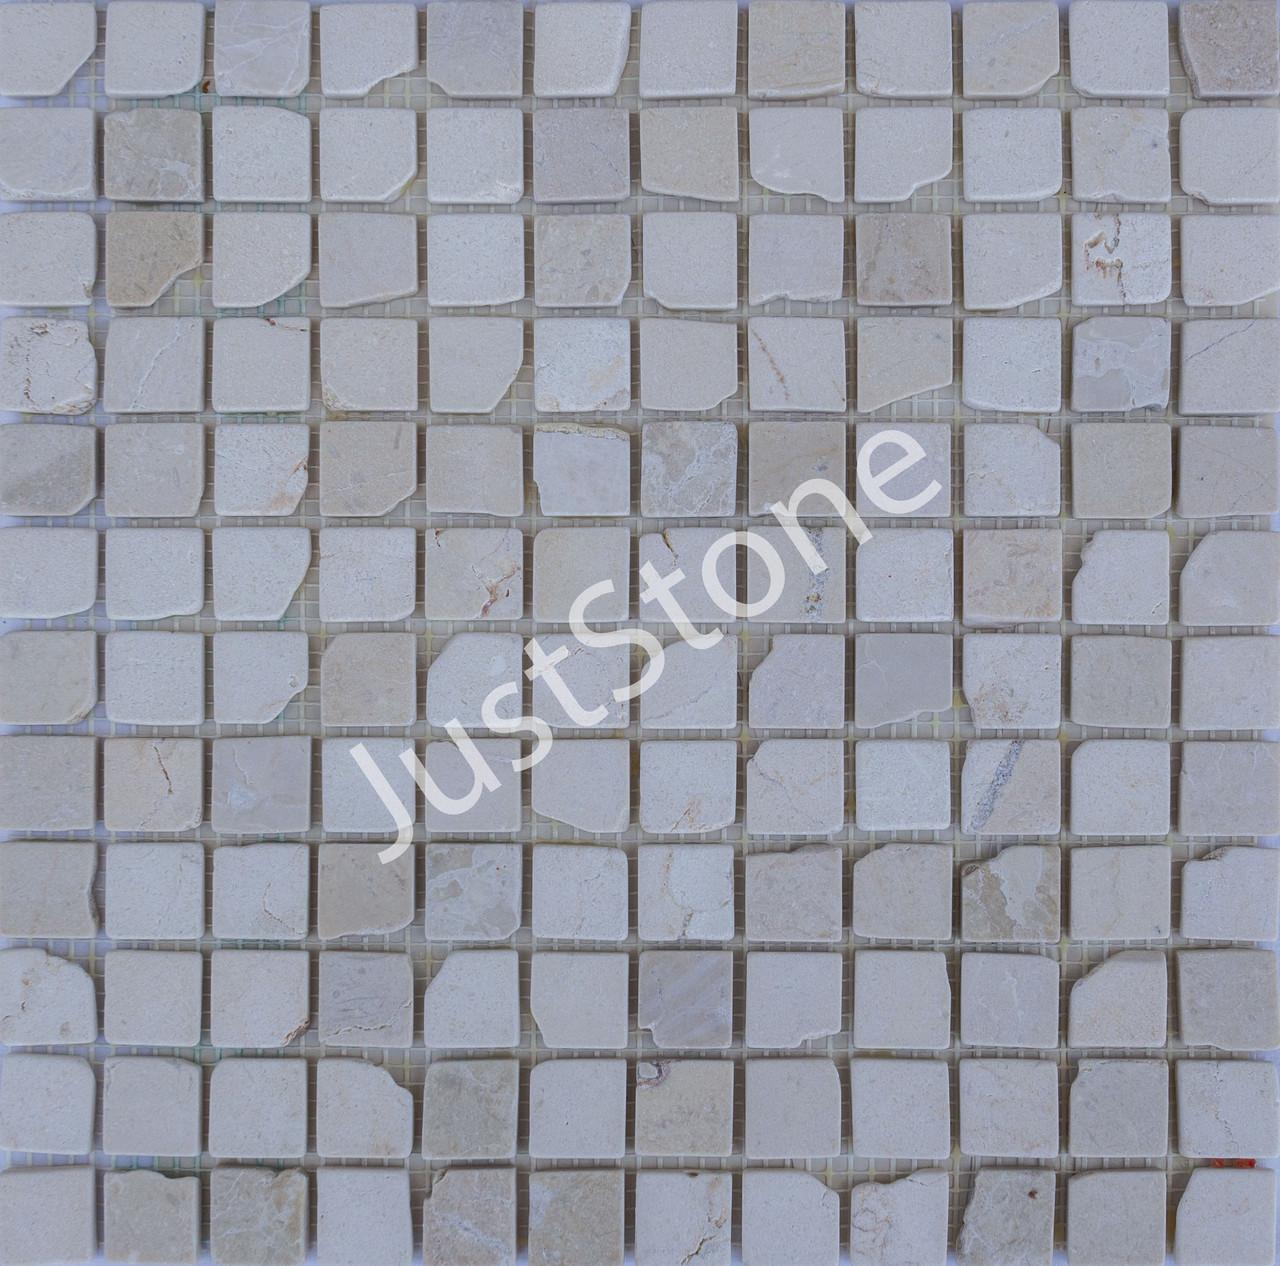 Мраморная Мозаика Стар.Валт.Ант. МКР-2СВА (23x23) 6 мм Beige Mix